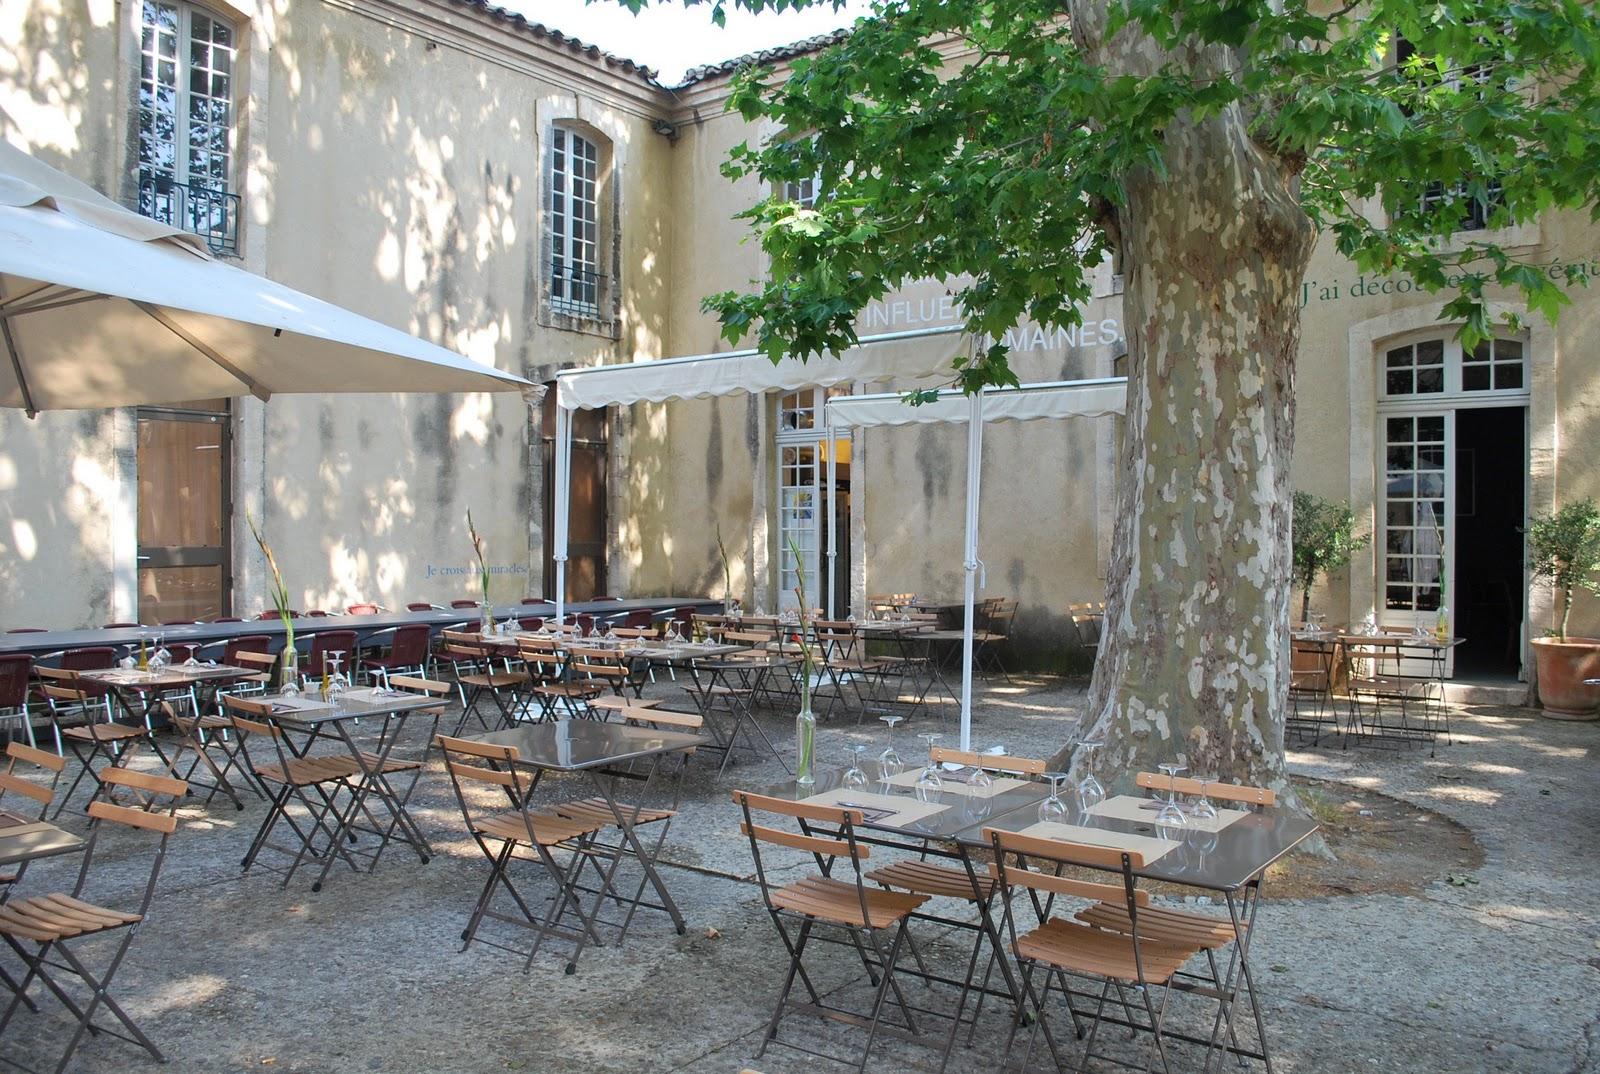 Restaurant Hotel De Caumont Aix Demain